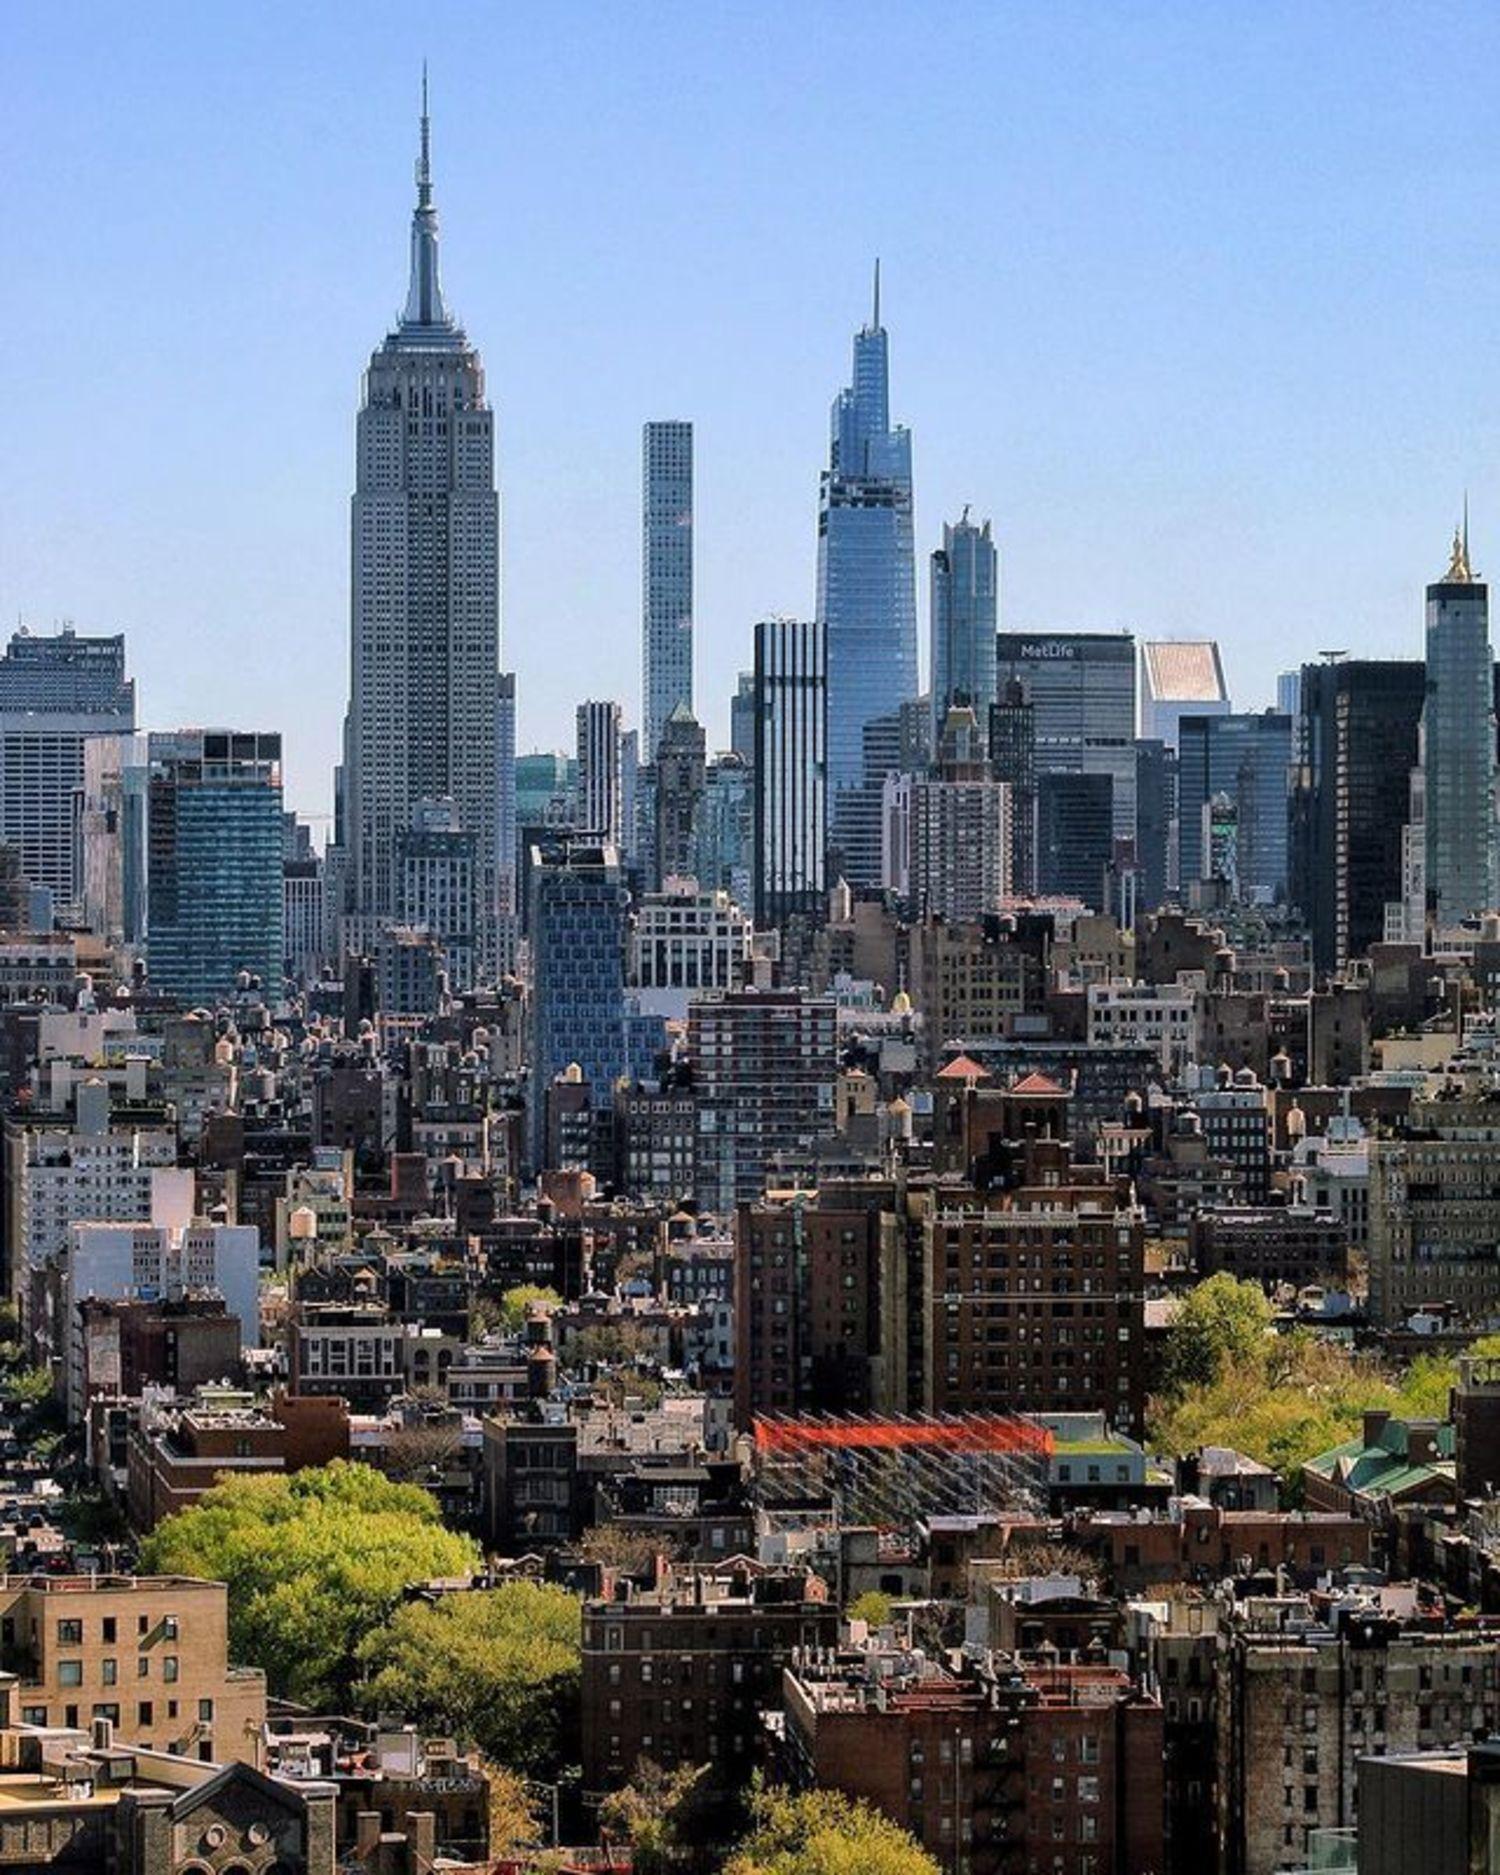 Chelsea and Midtown, Manhattan